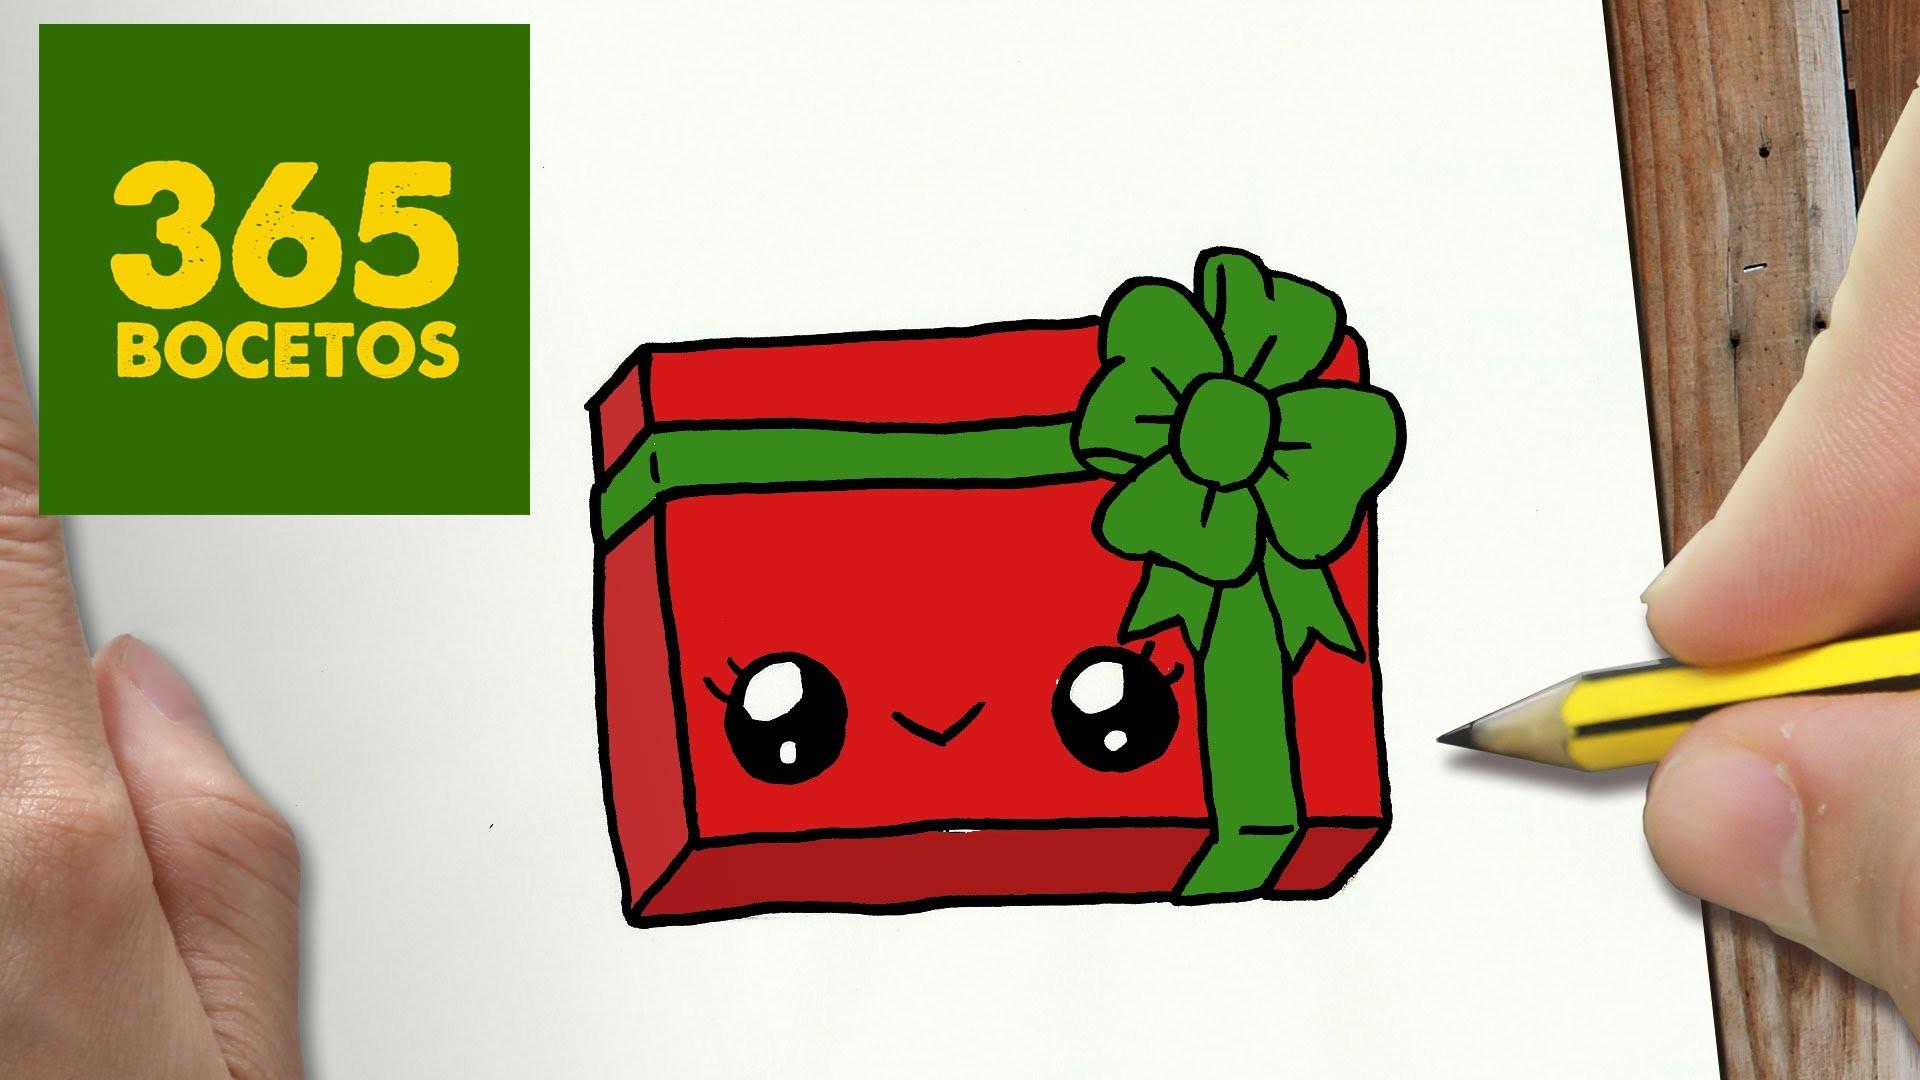 Como Dibujar Un Cuaderno Para Navidad Paso A Paso Dibujos: COMO DIBUJAR UN REGALO PARA NAVIDAD PASO A PASO: Dibujos